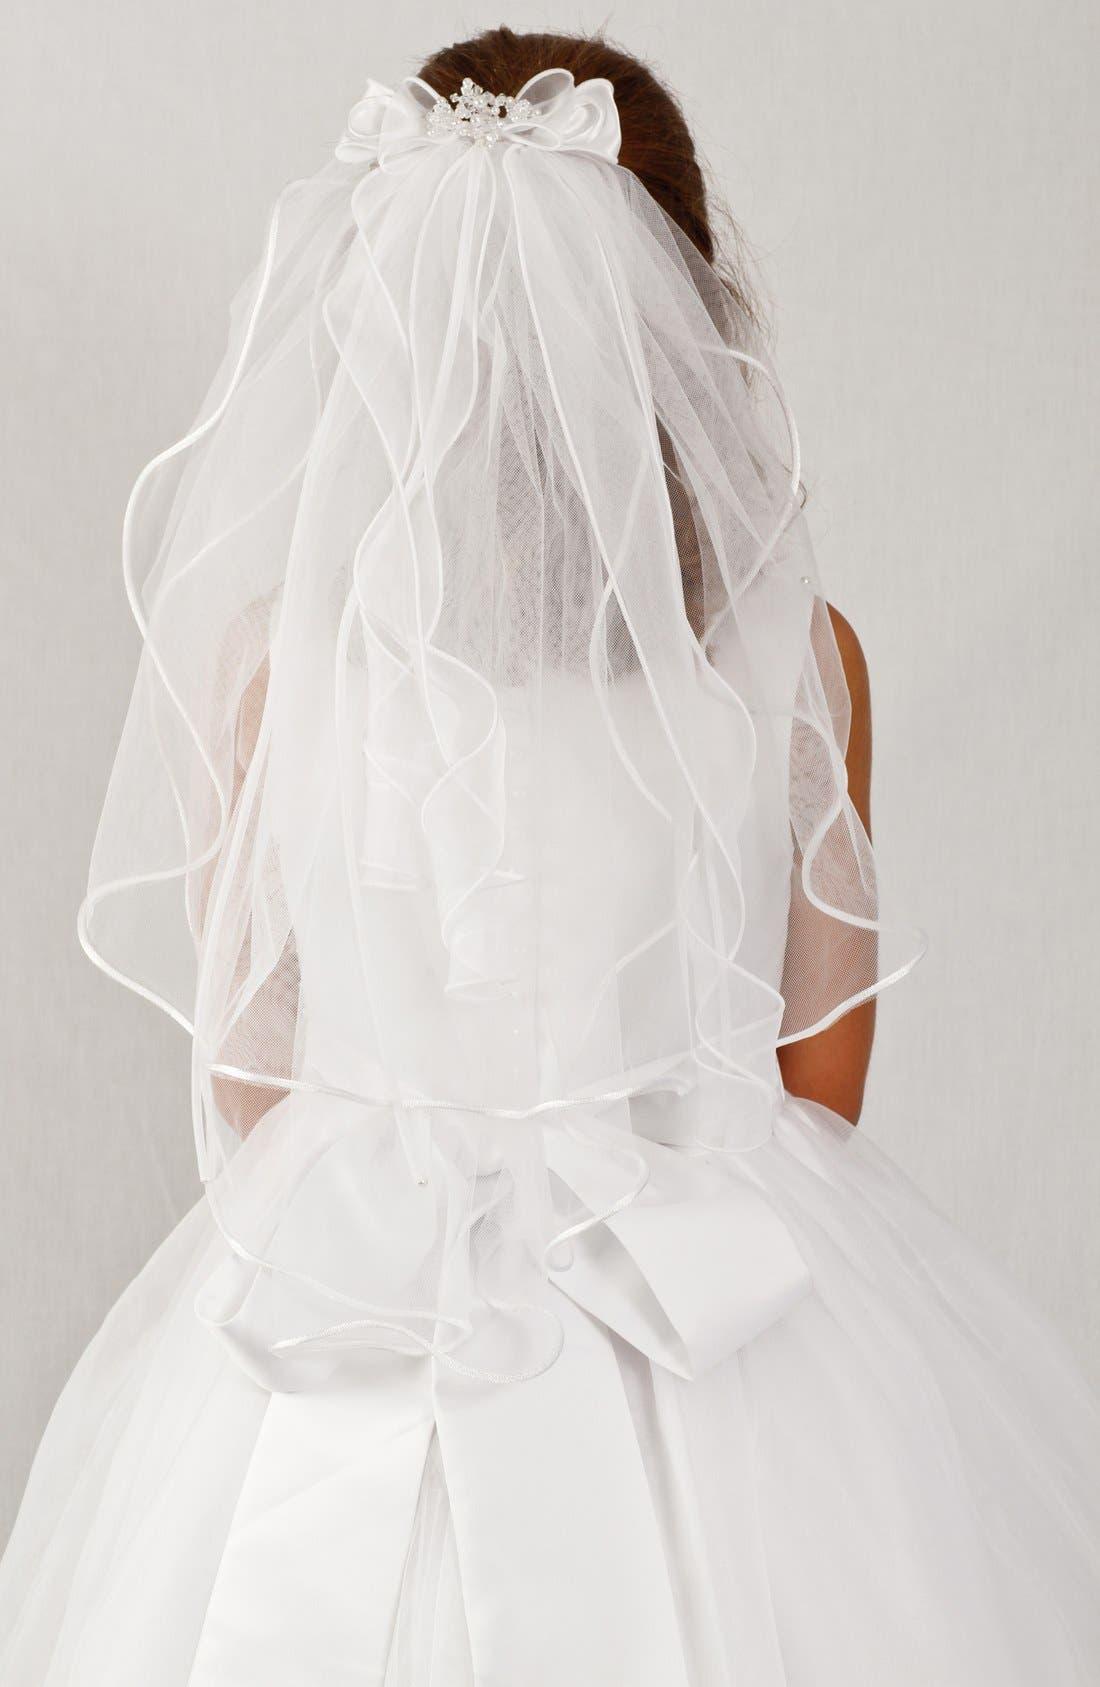 Main Image - Lauren Marie Organza Bow Veil (Girls)